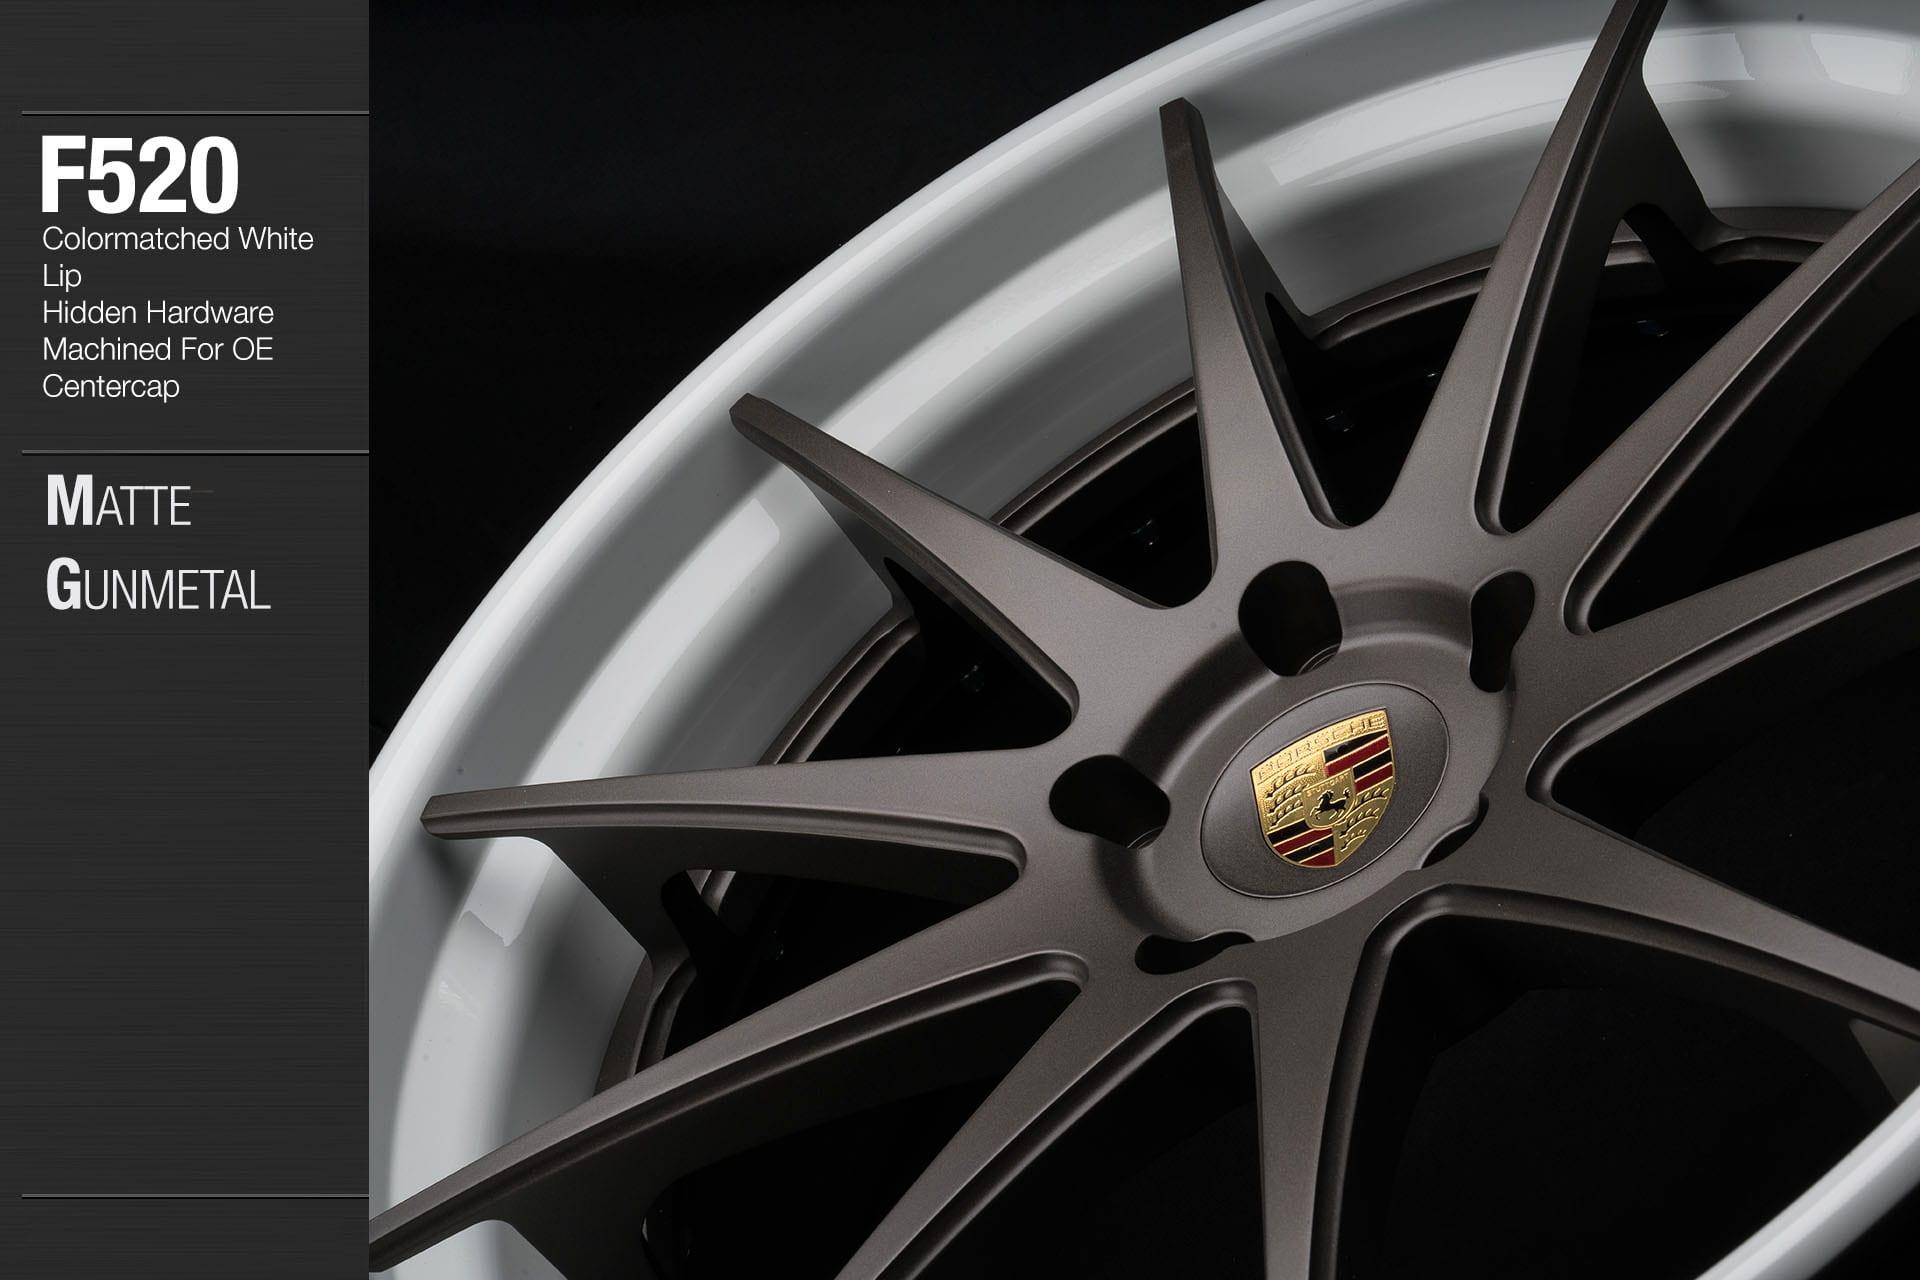 avant-garde-ag-wheels-f520-matte-gunmetal-face-colormatched-white-lip-hidden-hardware-machined-for-oe-centercap-2-min